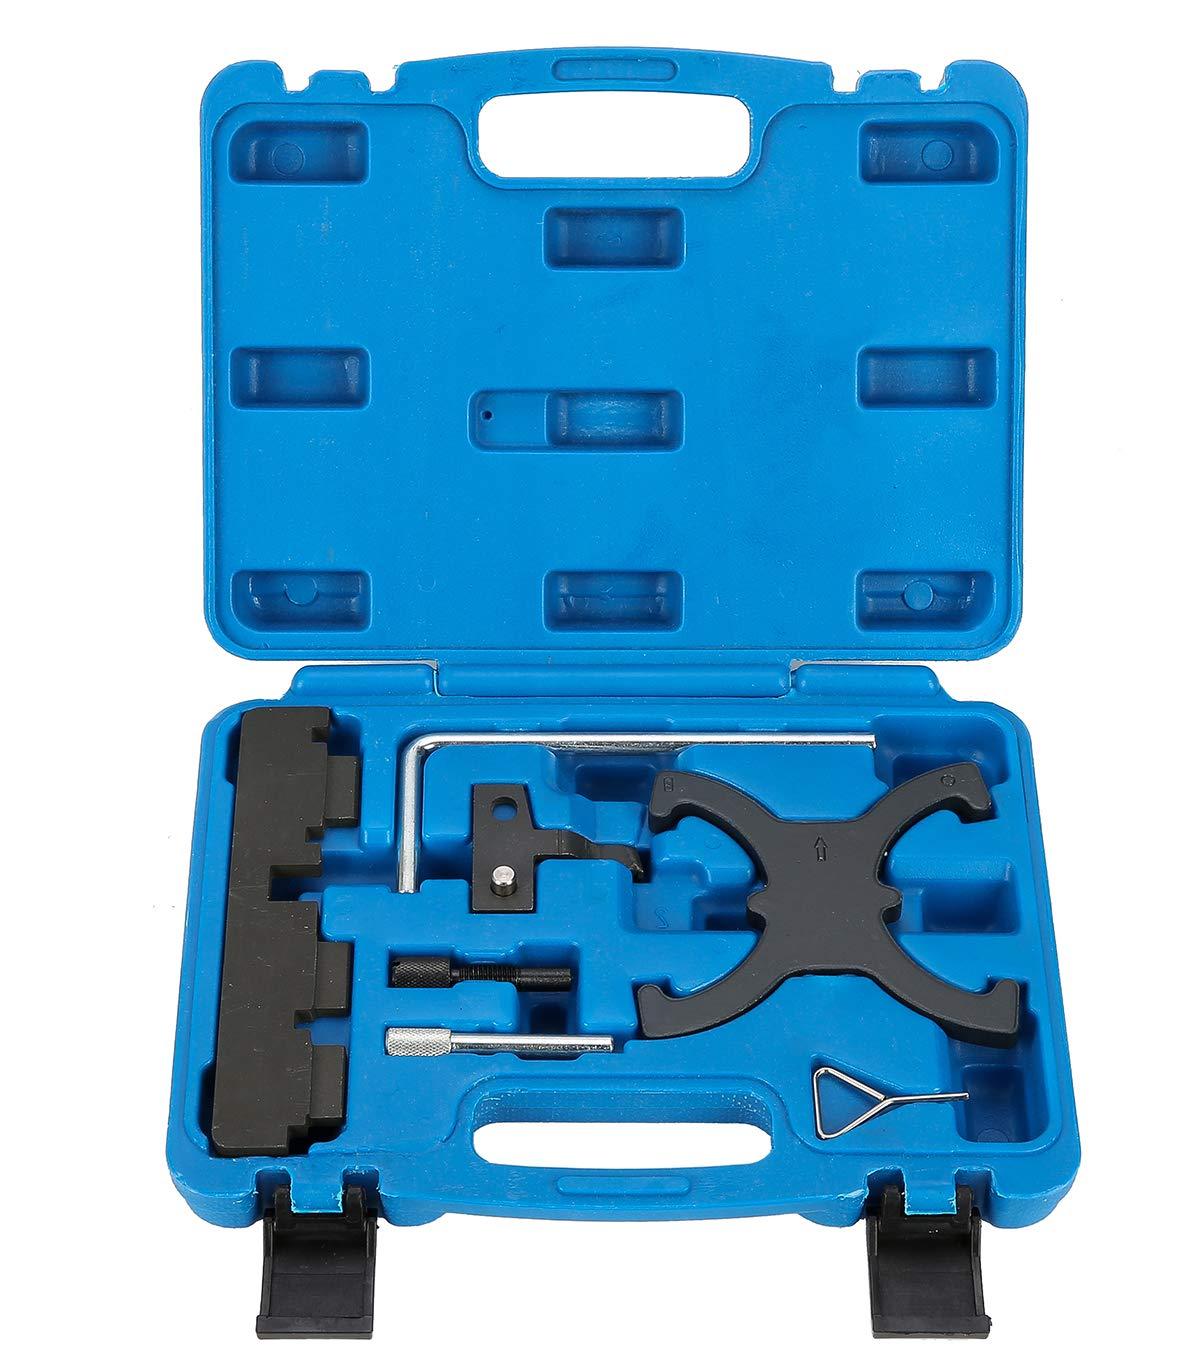 8MILELAKE Engine Camshaft Timing Locking Tool Set Kit for Ford Focus 1.6 Mazada 1.6 Eco Boost Volvo freebirdtrading ZR8520